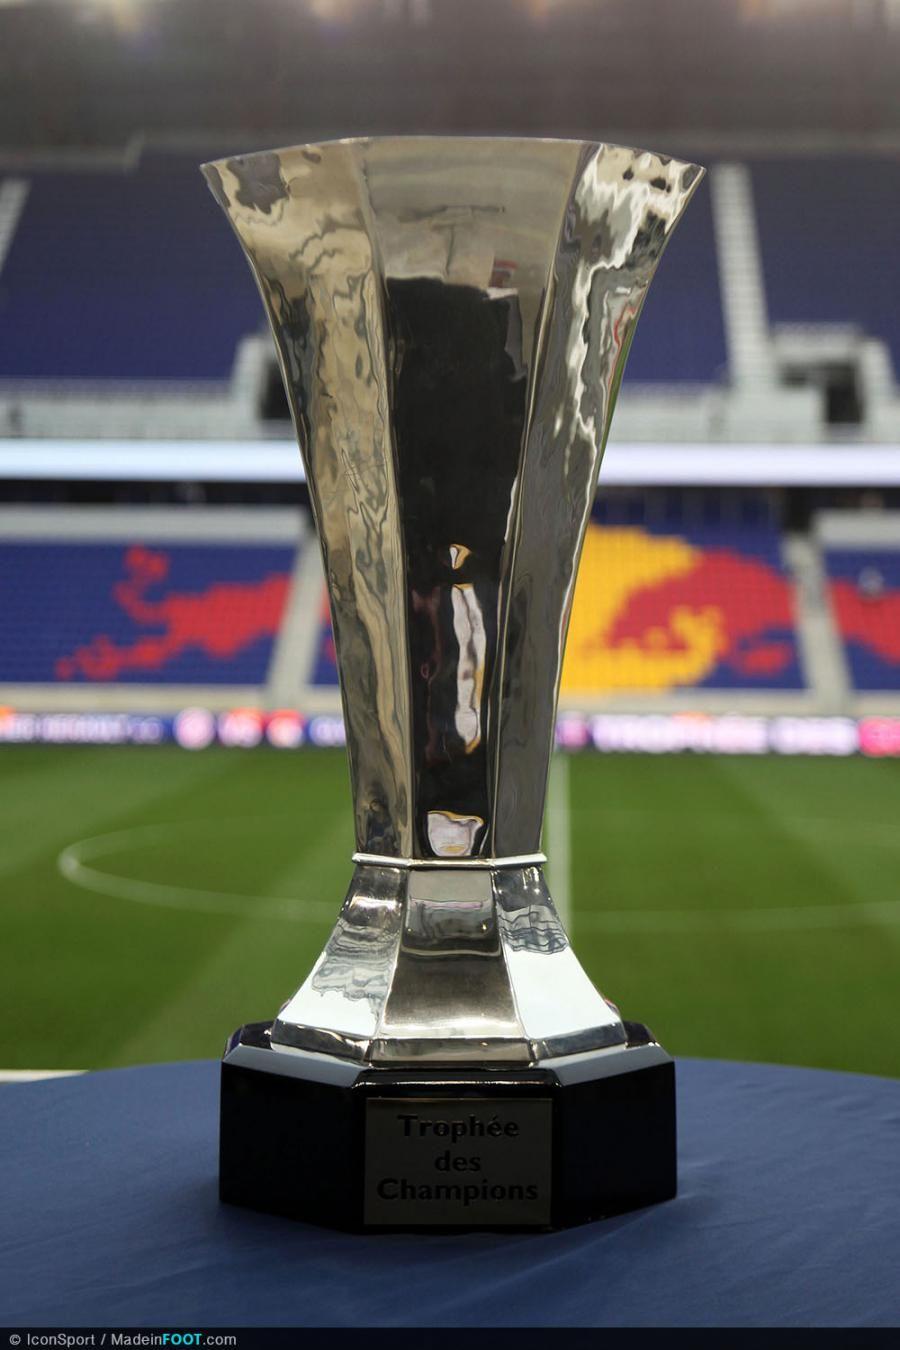 Supercup Frankreich